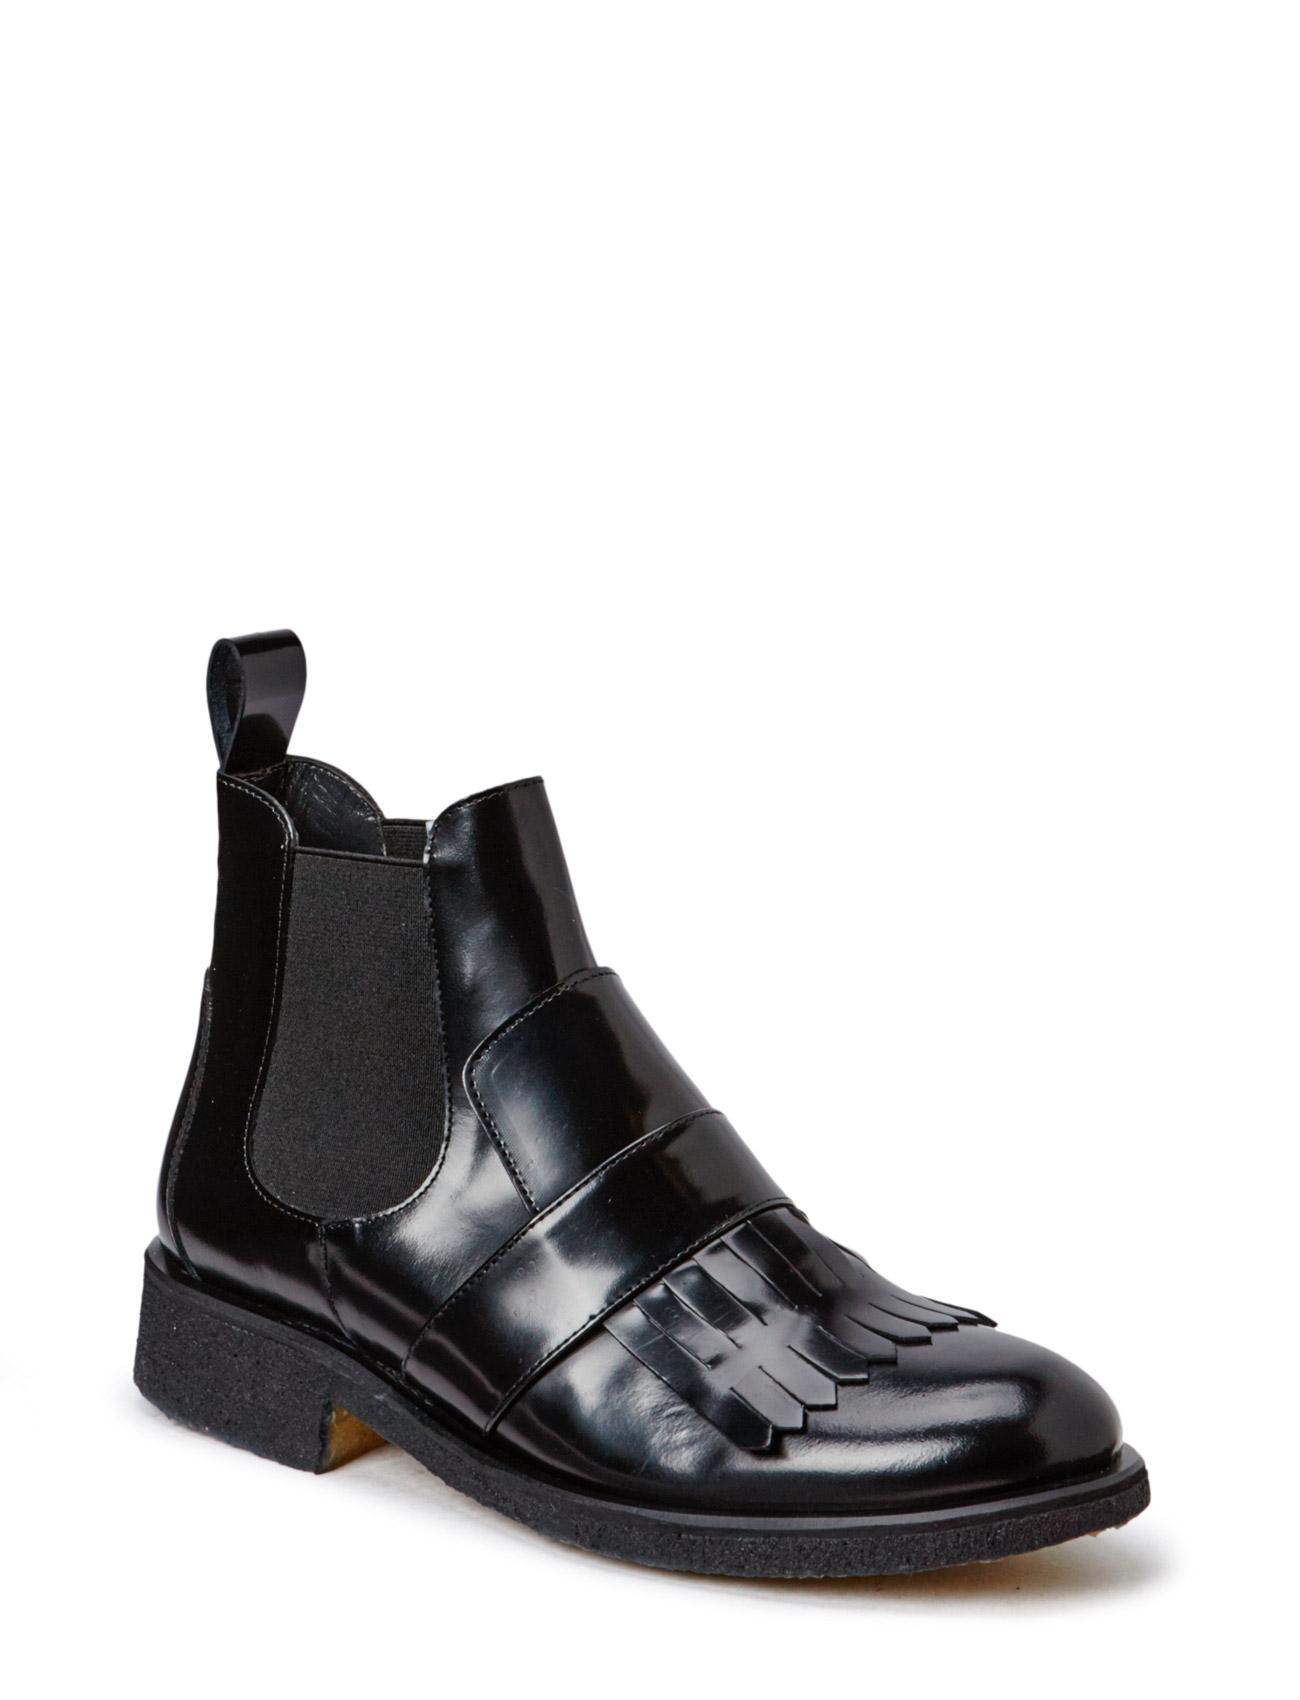 Modern Chelsea With Fringe Detail ANGULUS Støvler til Kvinder i